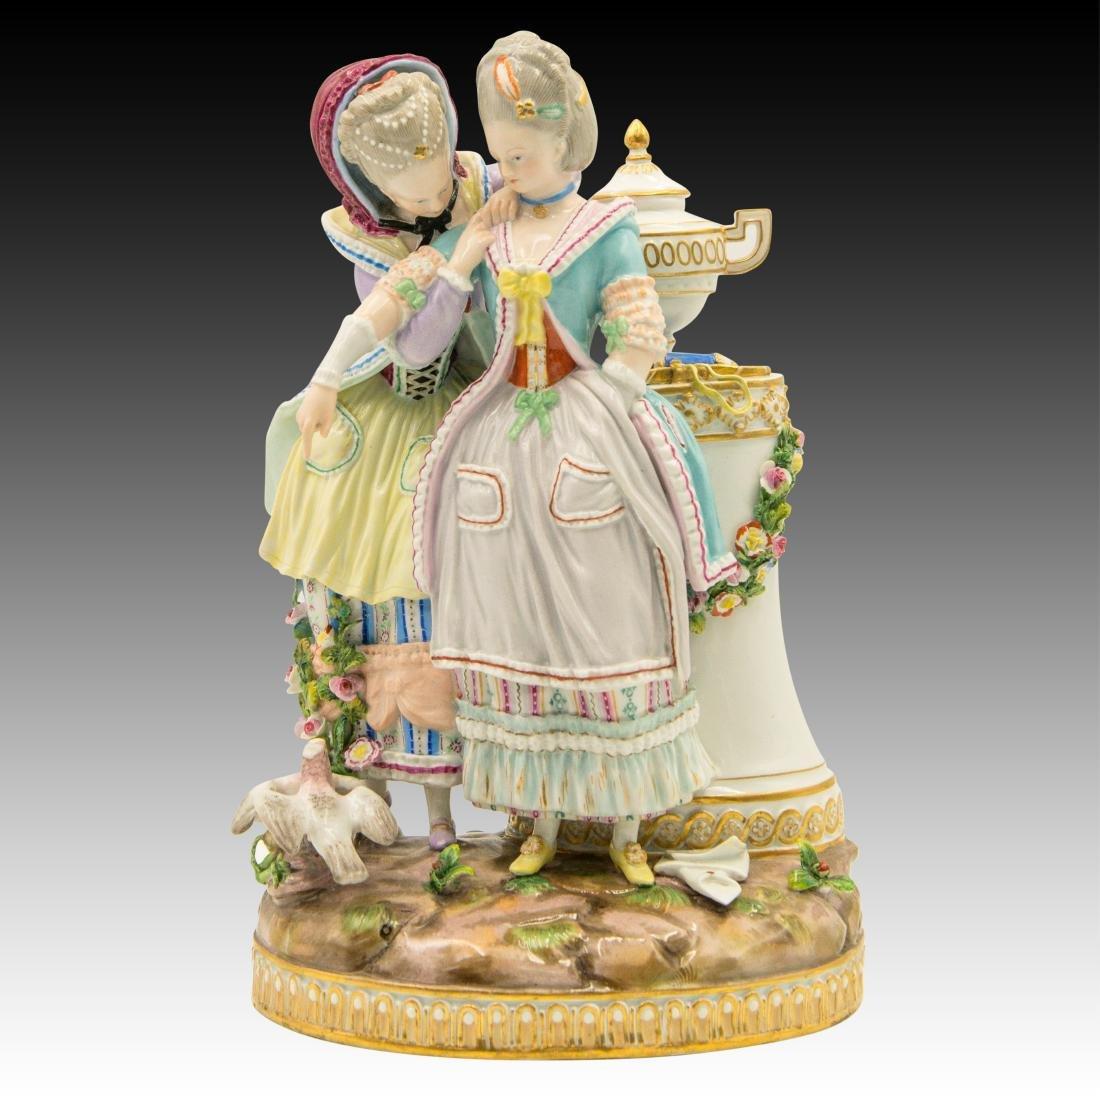 Meissen Figurine with 2 Women with Birds and Urn